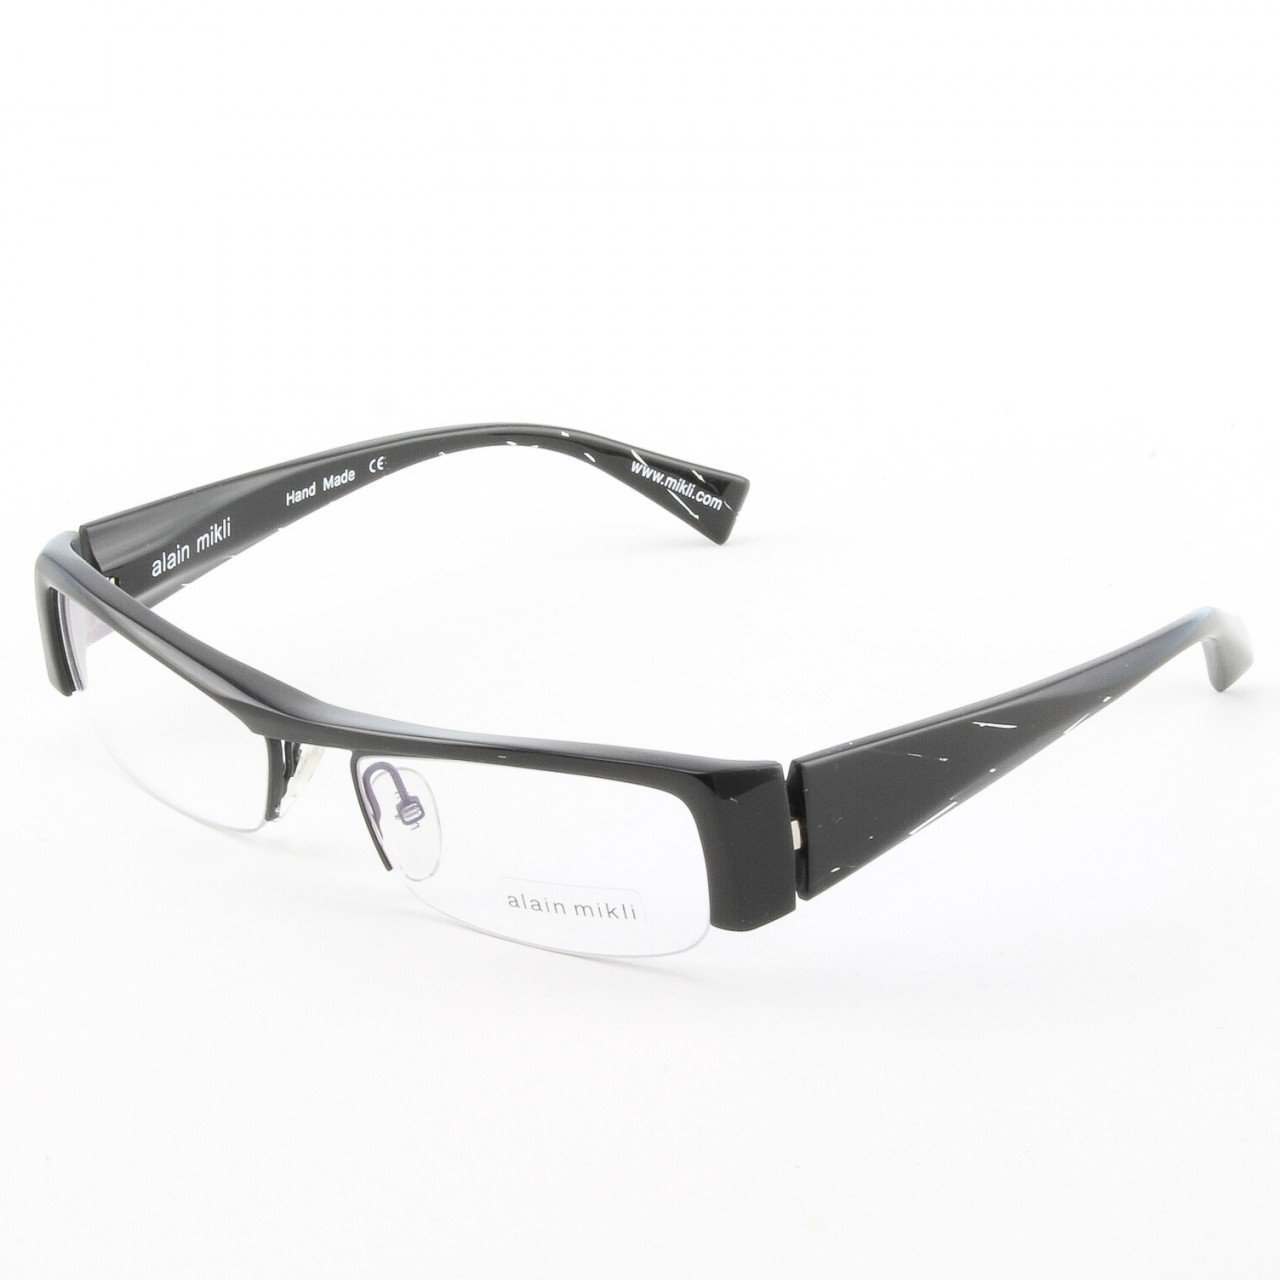 Alain Mikli Eyeglasses AL0795 Col. 1 High Gloss Black with Subtle Diagonal Pattern